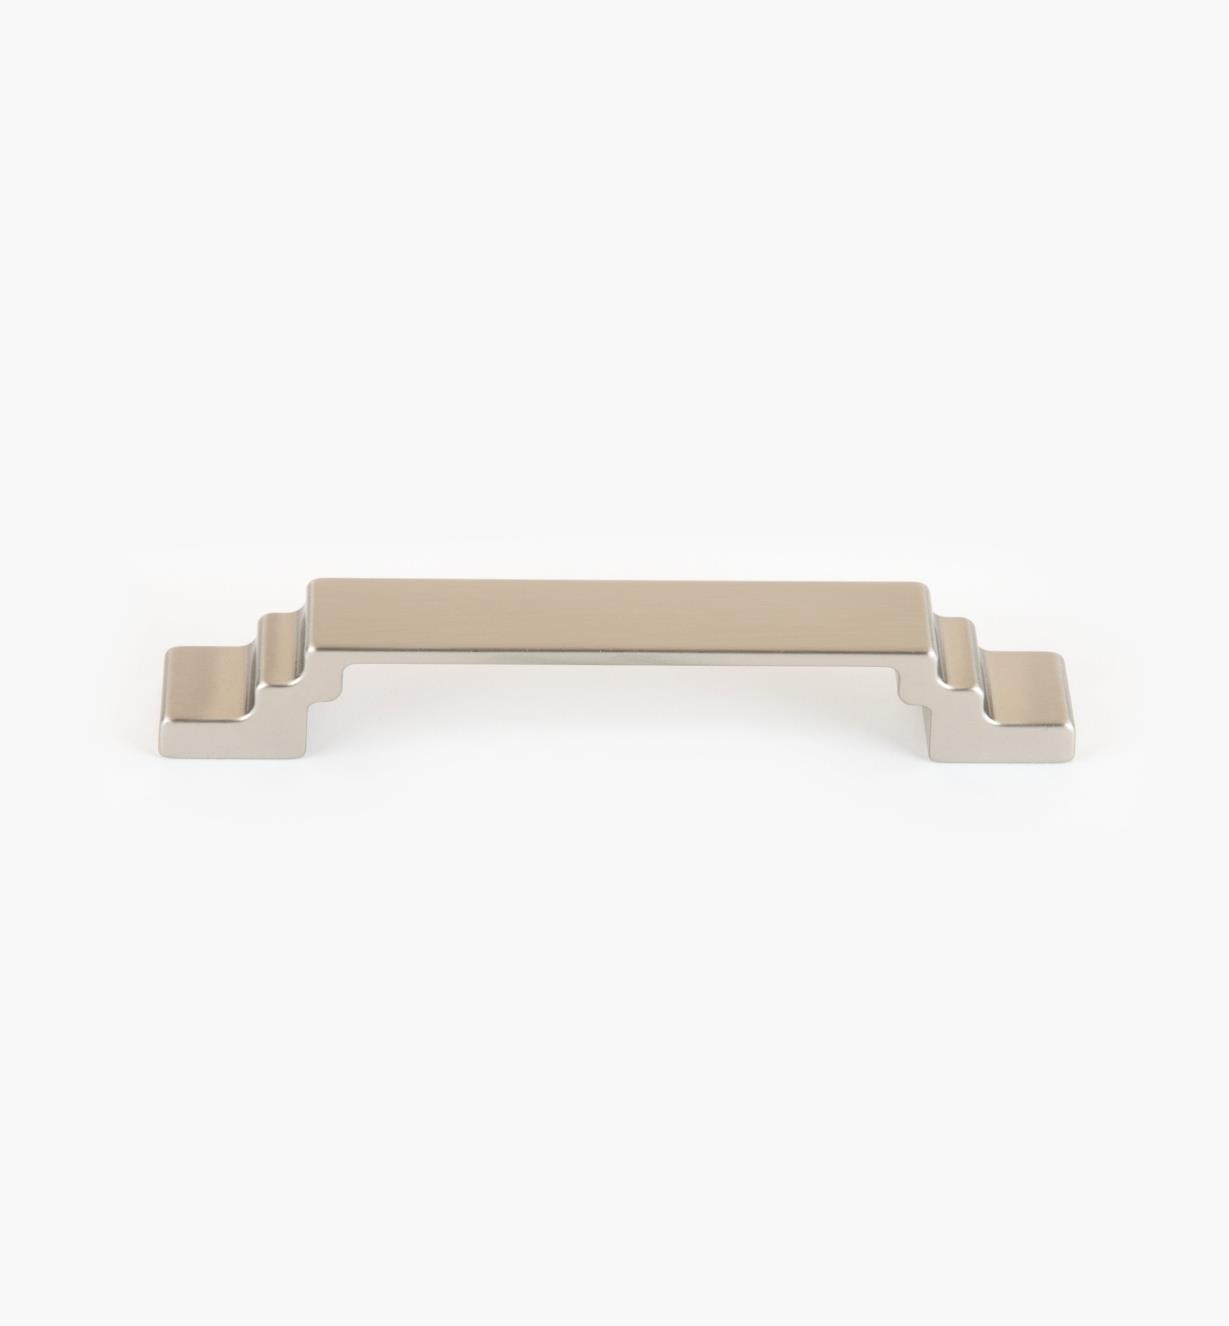 00W5590 - Scala Satin Nickel 128mm Handle, each